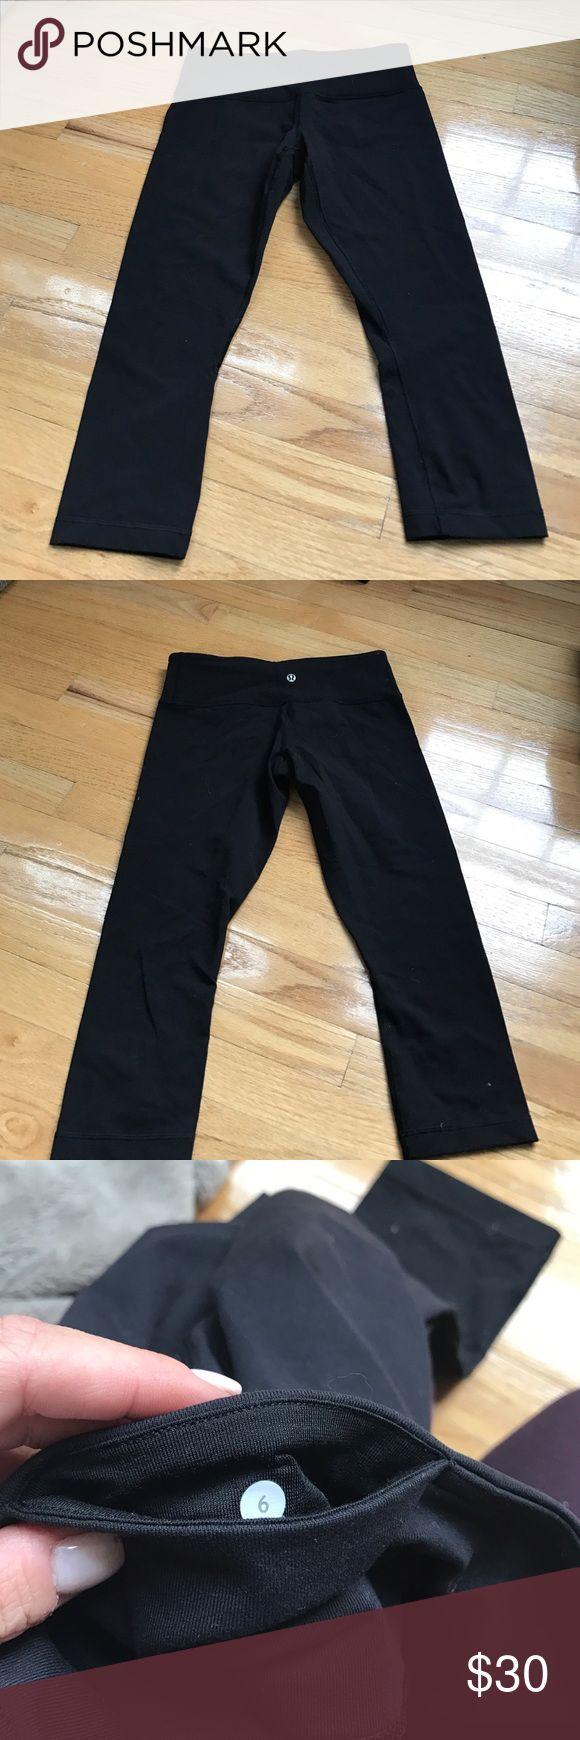 EUC lululemon black crop pant EUC black lululemon crop pants. Size 6. Only worn once. No trades lululemon athletica Pants Ankle & Cropped